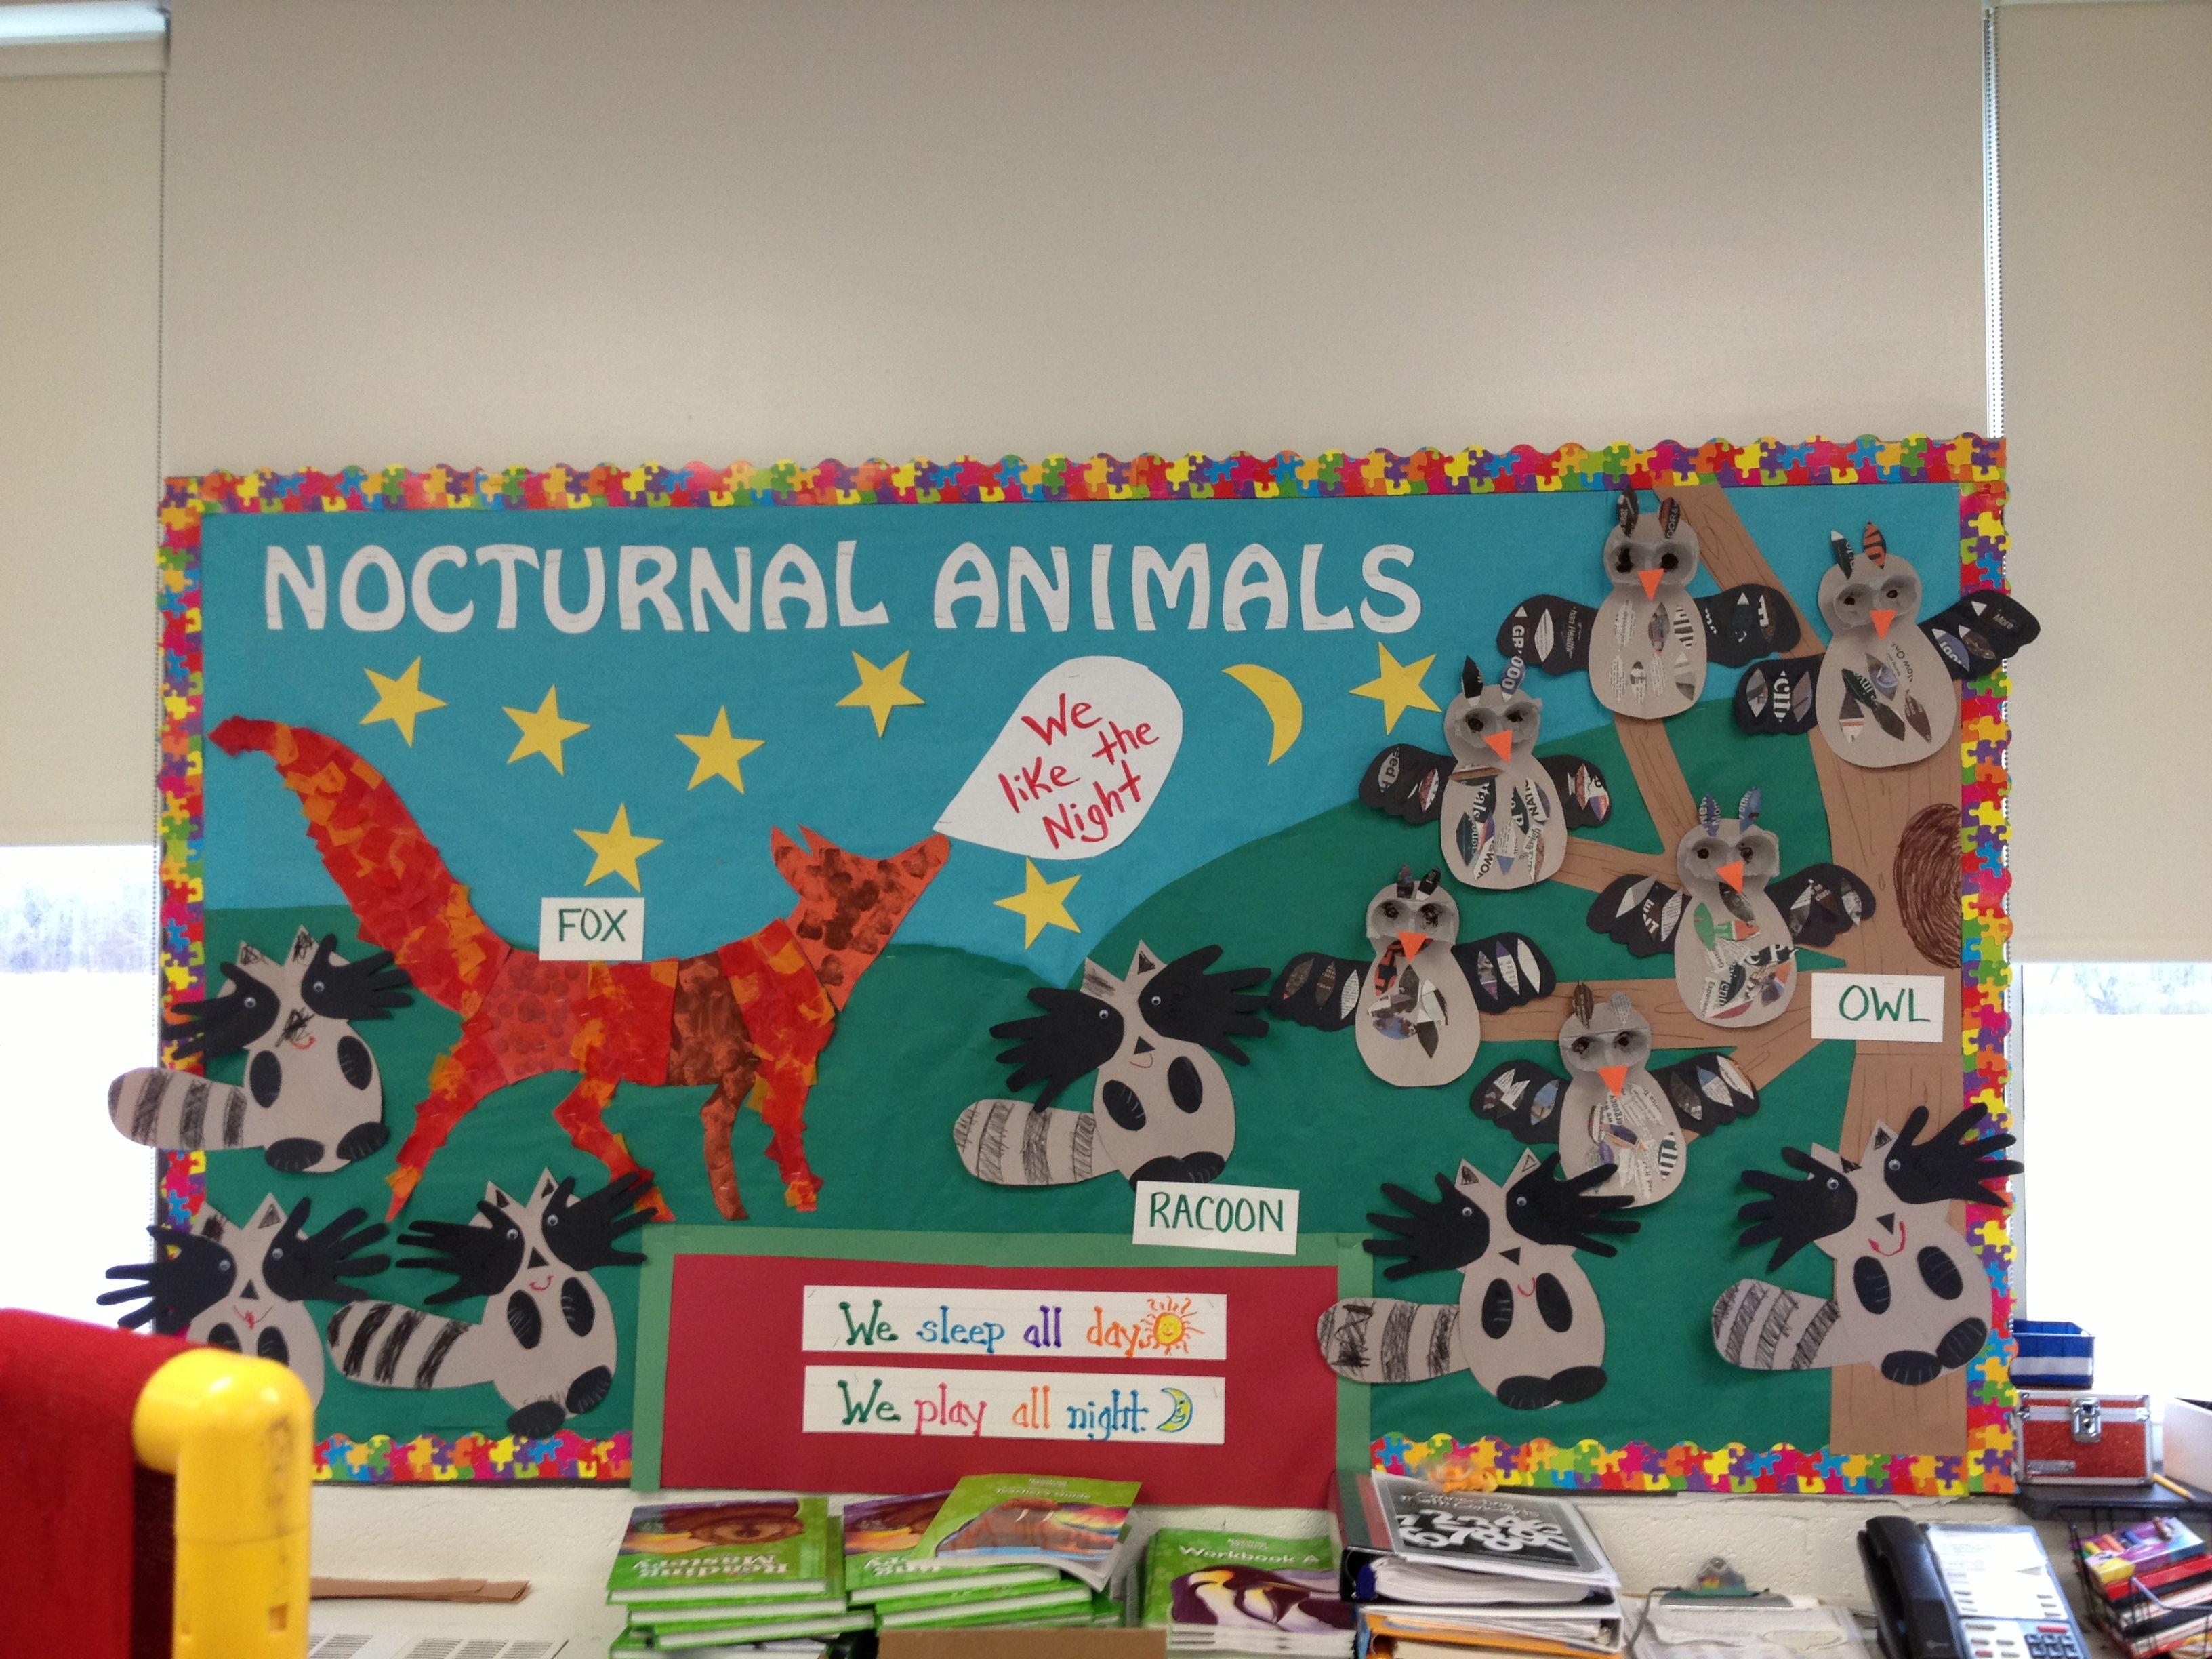 Nocturnal Animals Bulletin Board